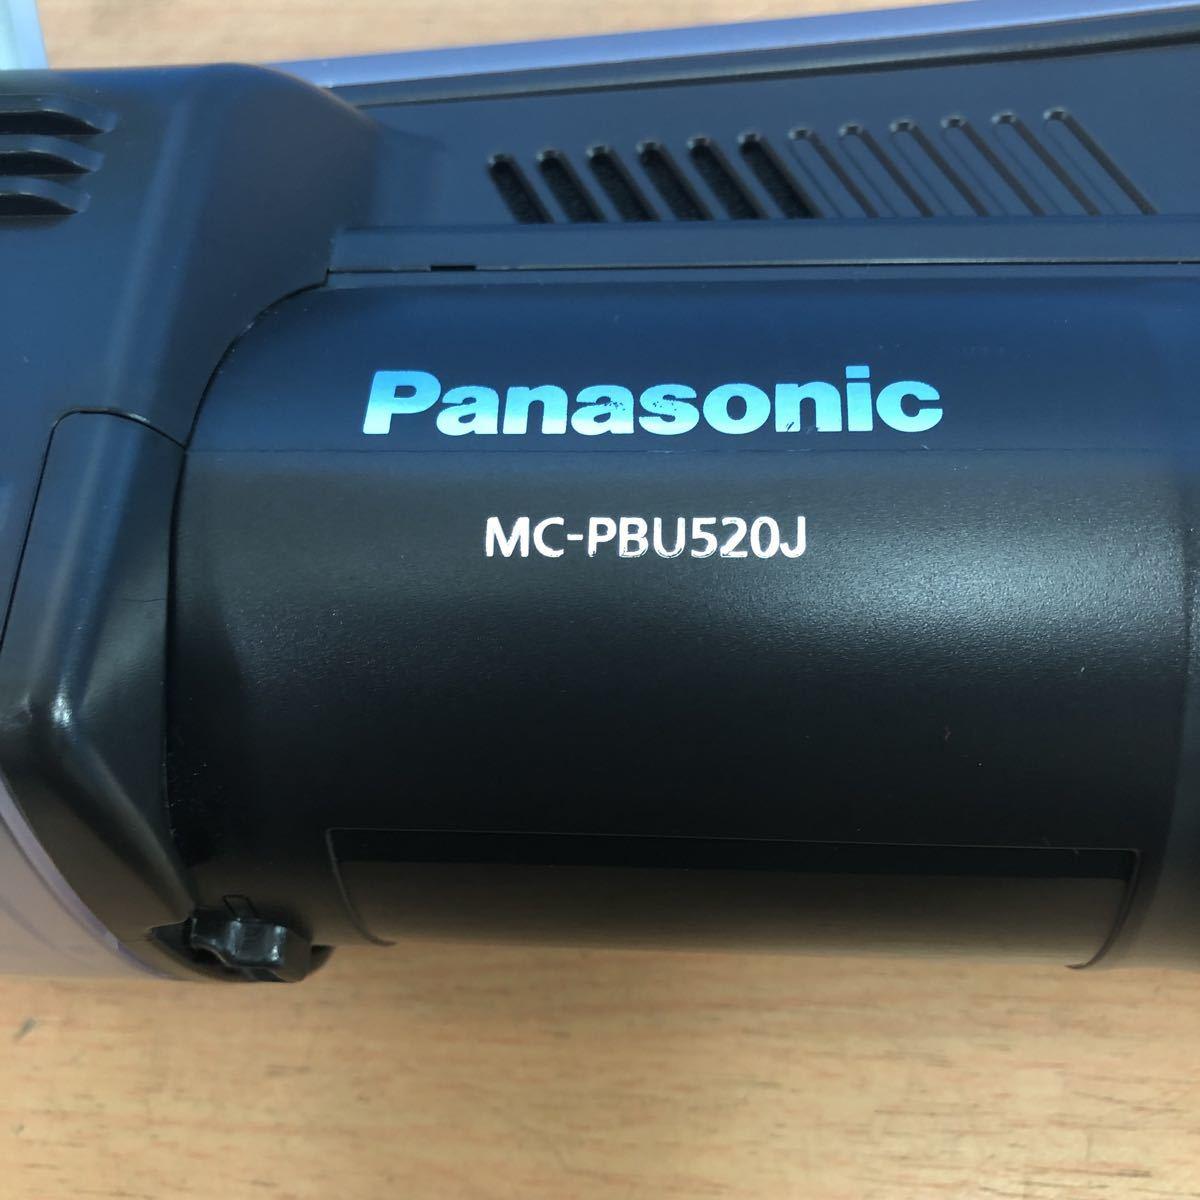 Panasonic ハウスダスト発見センサー付き 紙パック式コードレスクリーナー MC-PBU520J 店舗展示サンプル用実演機 (25)_画像8